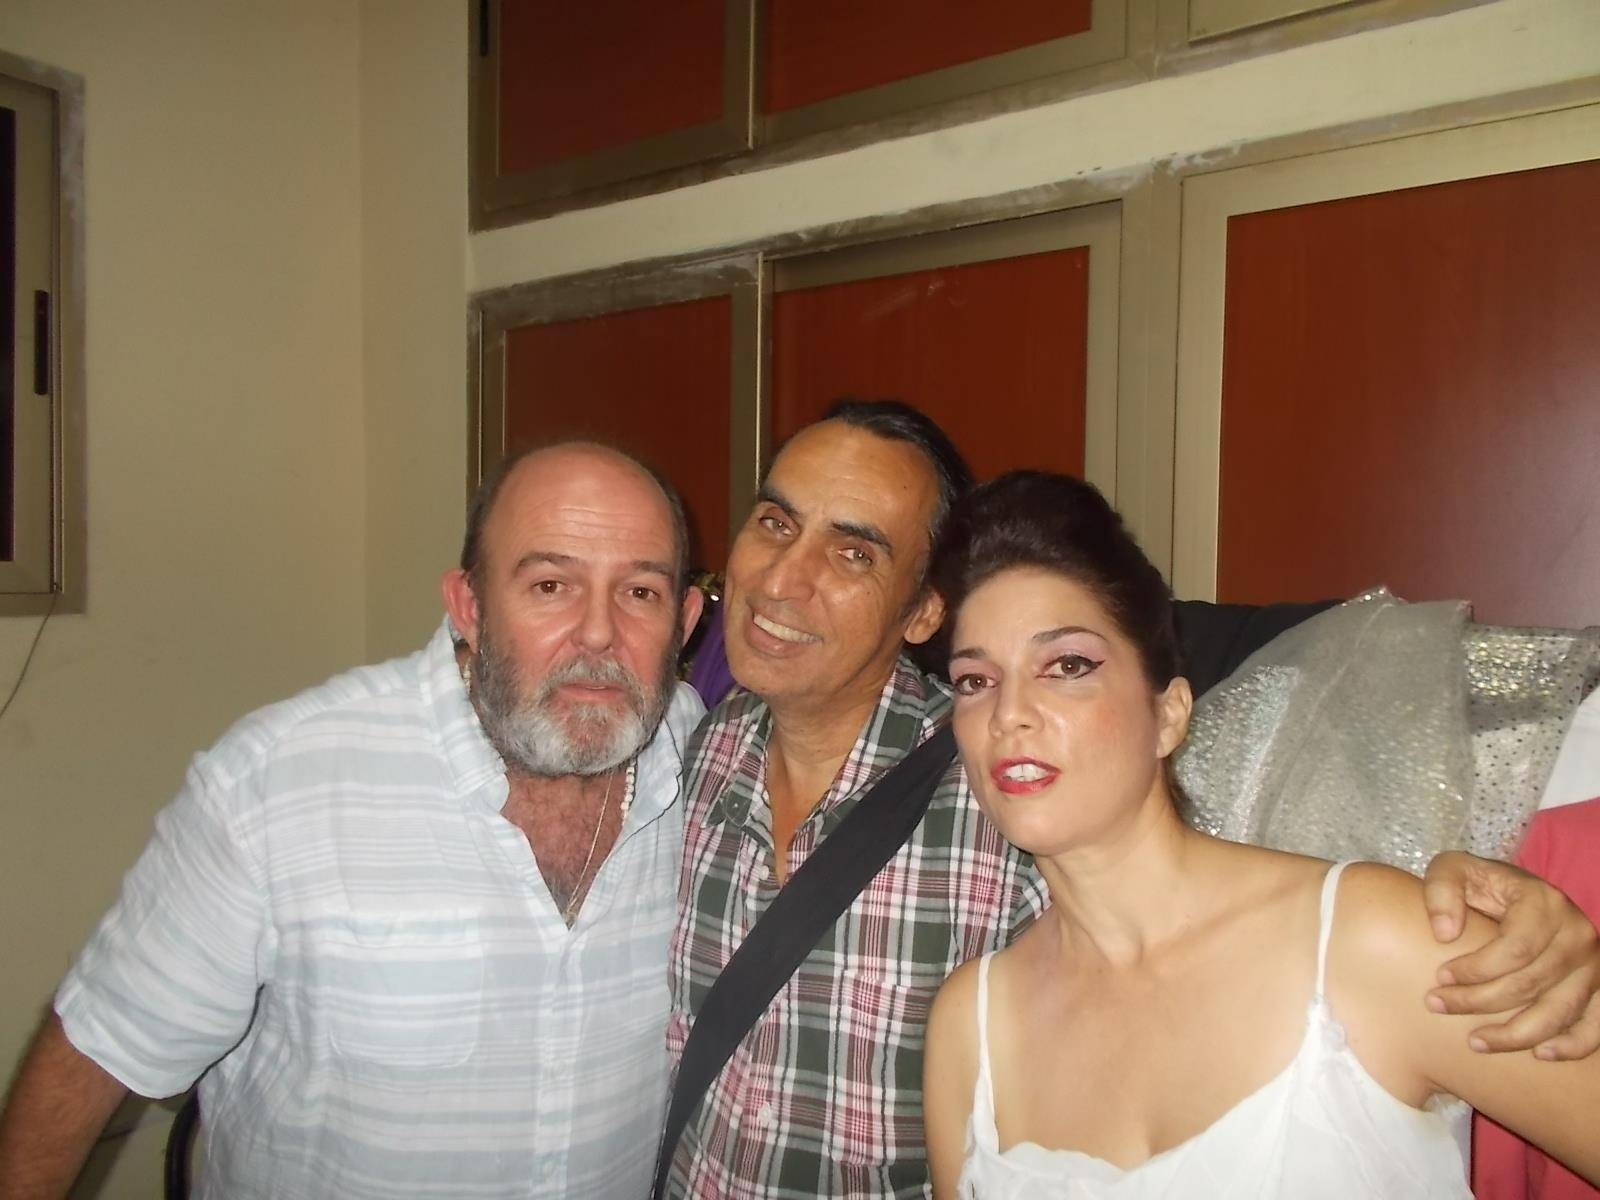 Carlos Díaz with Juan Piñera and Bárbara Llanes. Photo: Norge Espinosa.